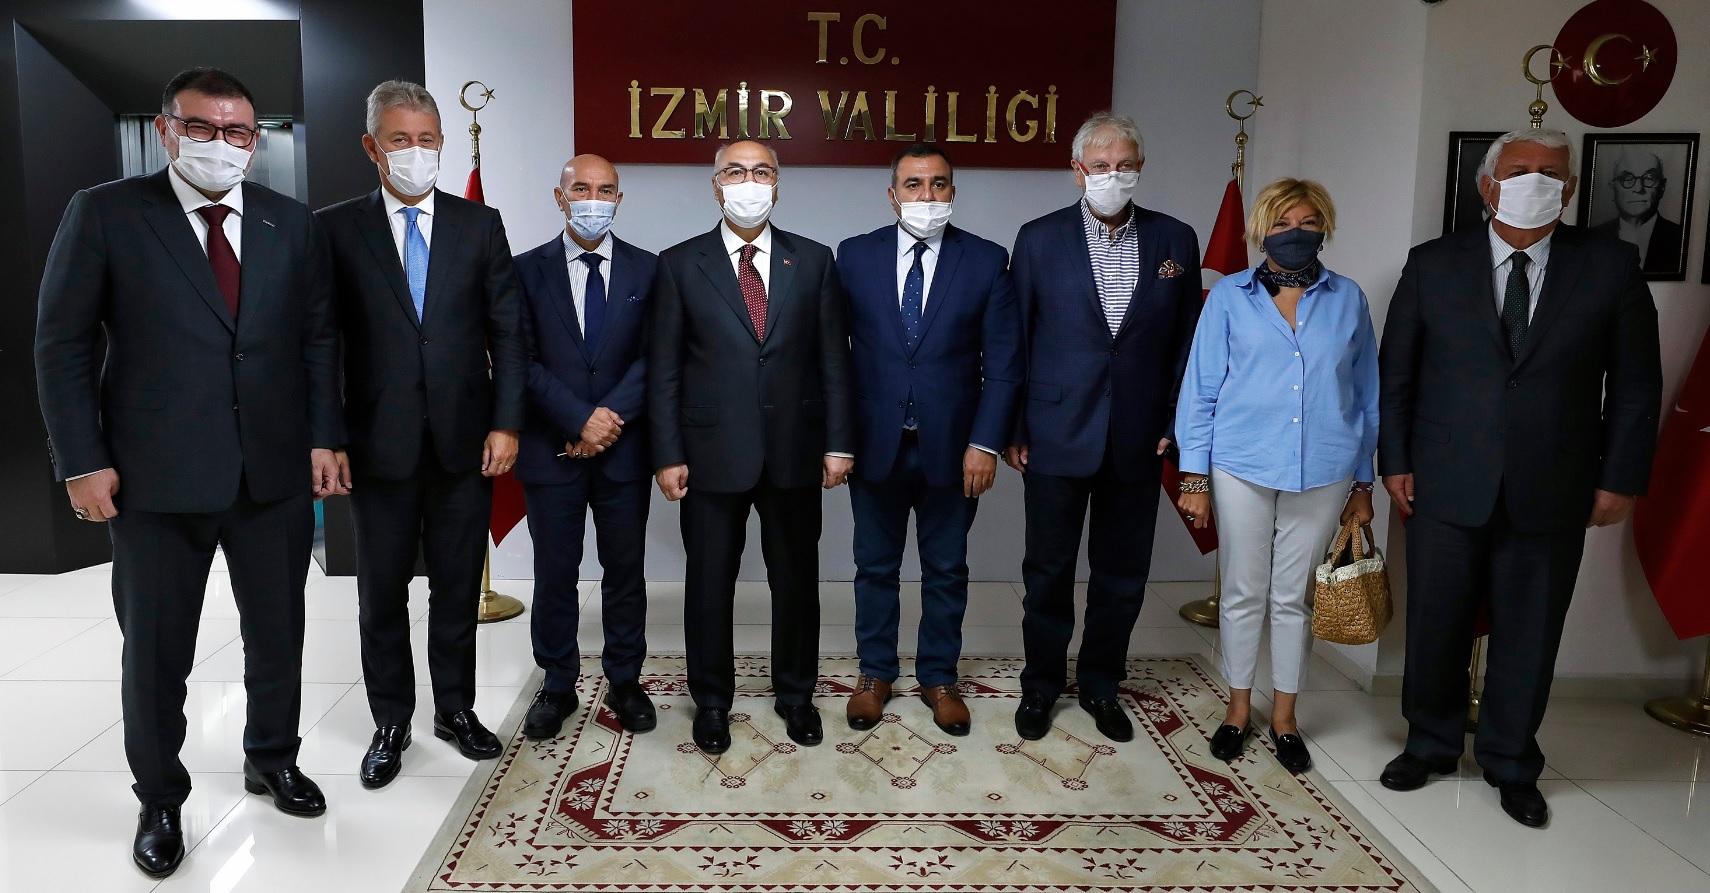 İZMİR'DEN AZERBAYCAN'A DESTEK MESAJI